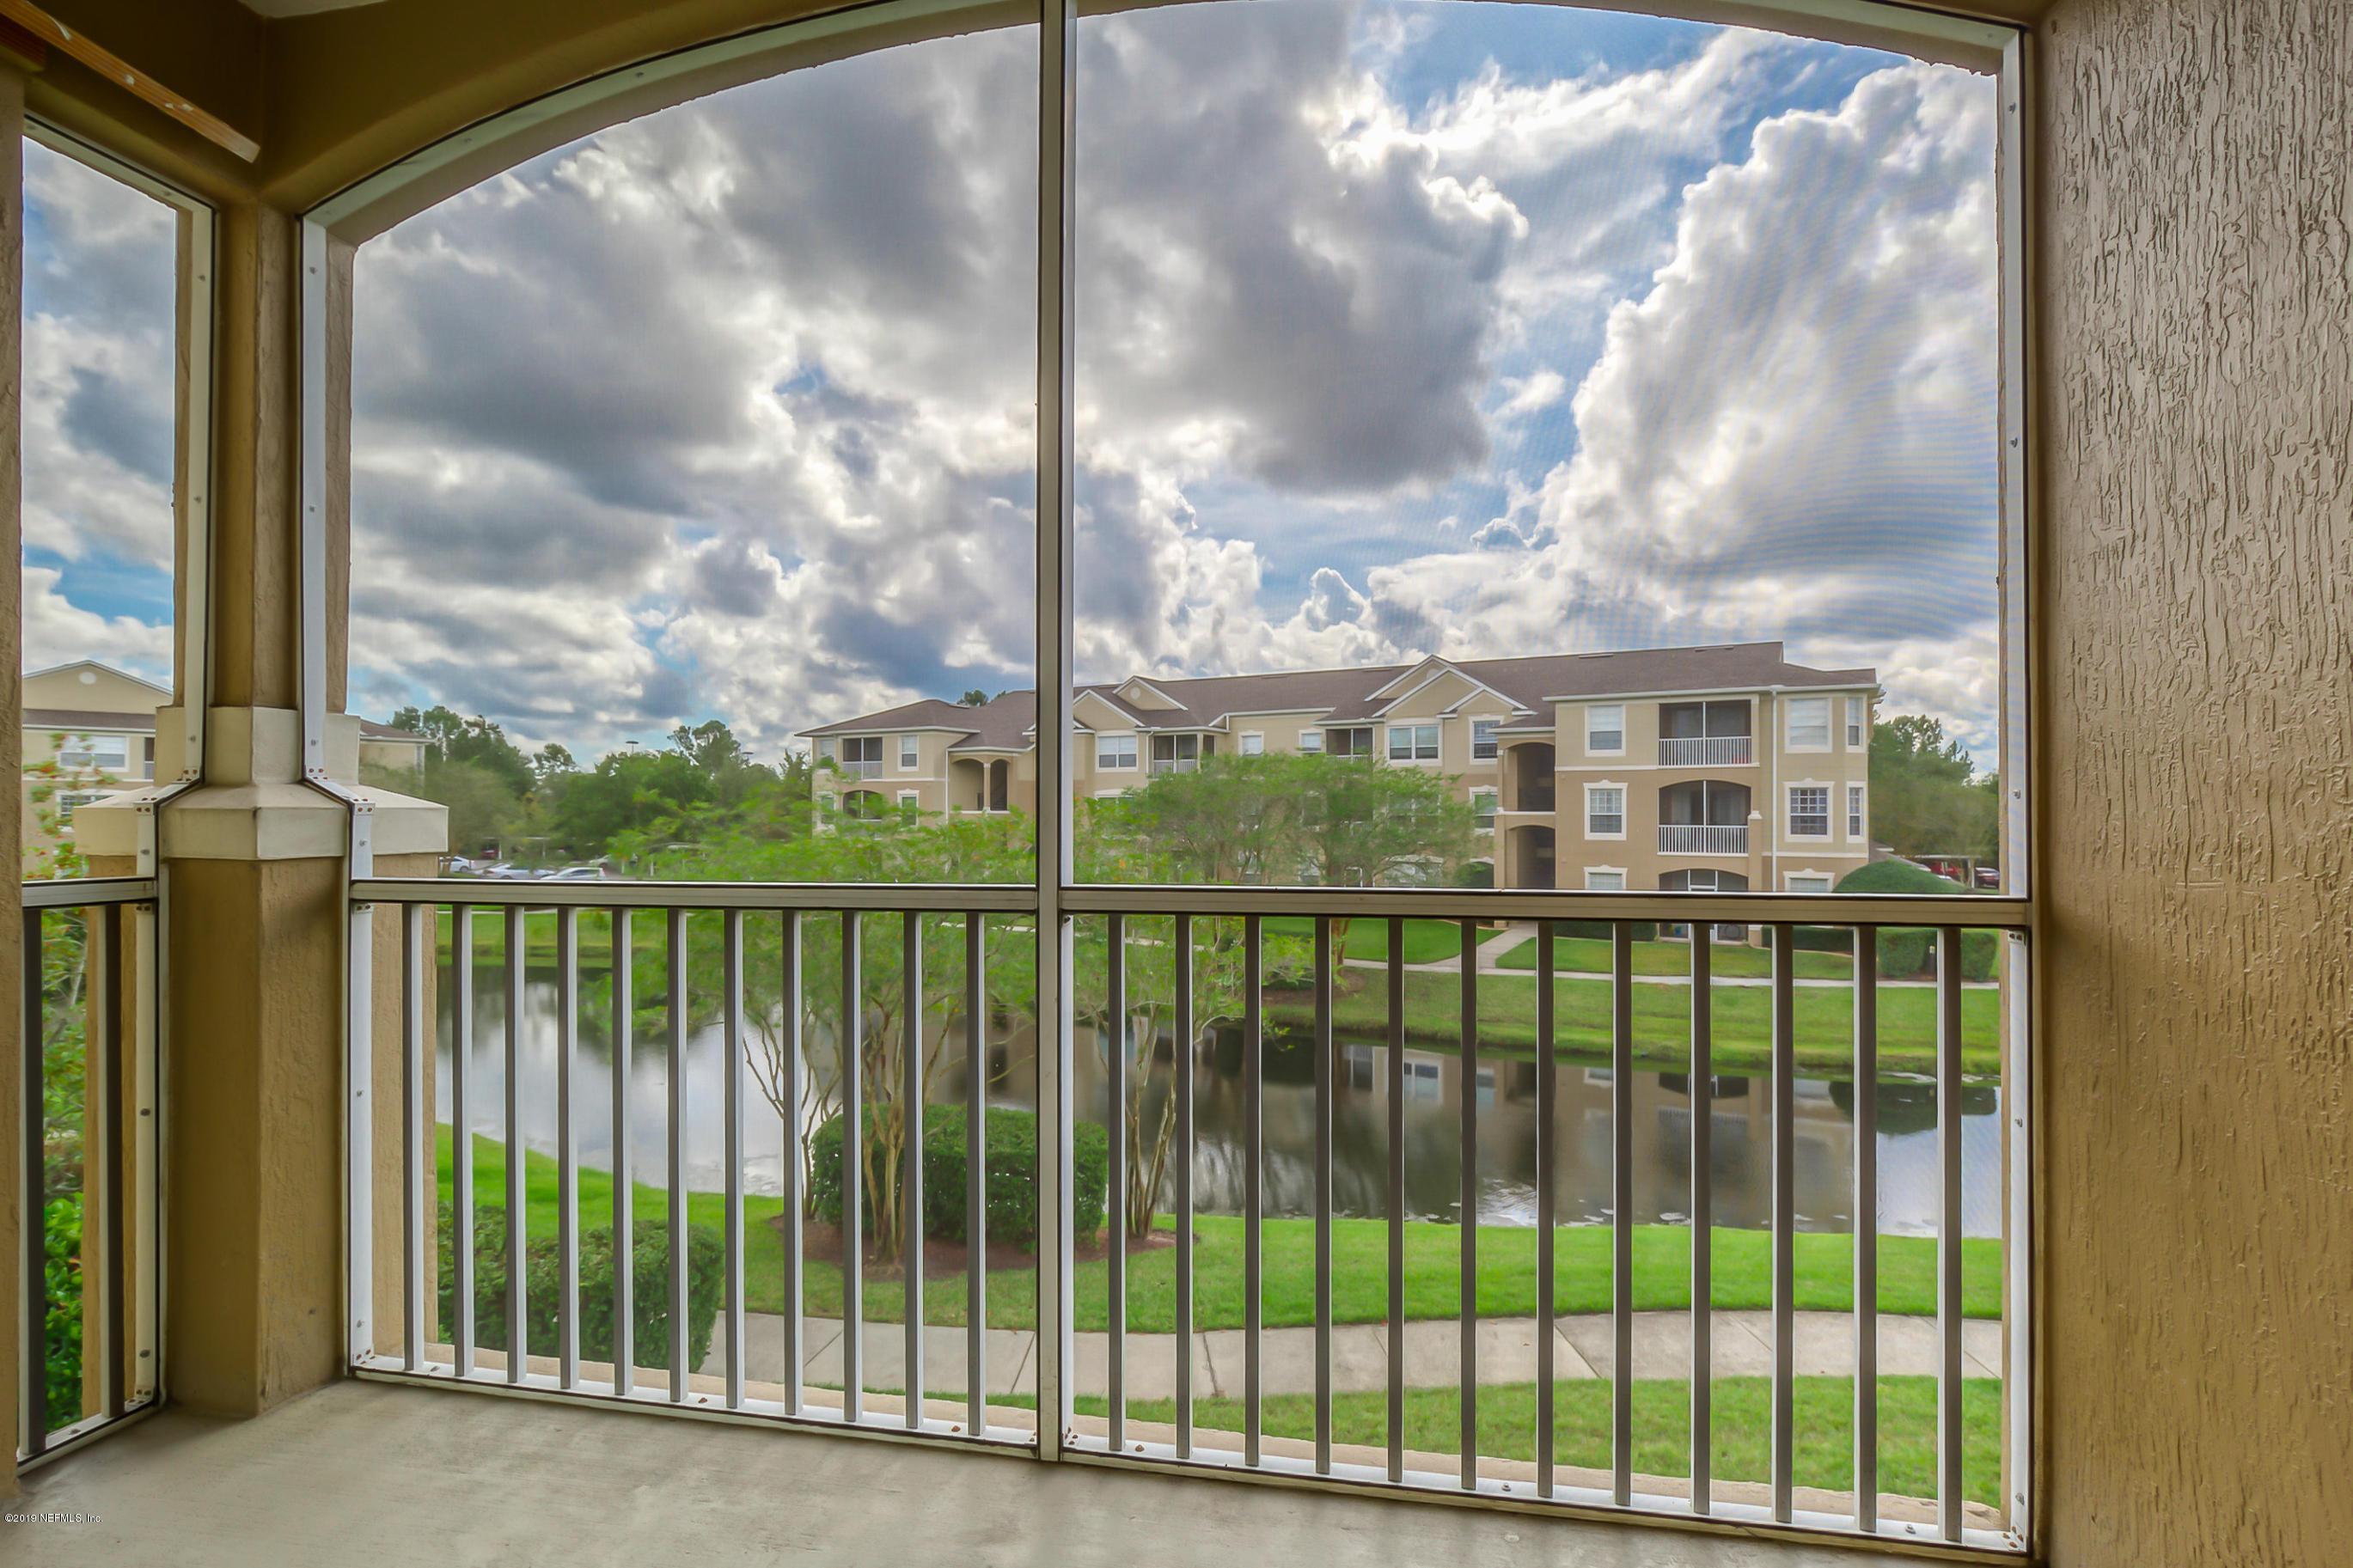 7990 BAYMEADOWS- JACKSONVILLE- FLORIDA 32256, 3 Bedrooms Bedrooms, ,2 BathroomsBathrooms,Condo,For sale,BAYMEADOWS,1007837